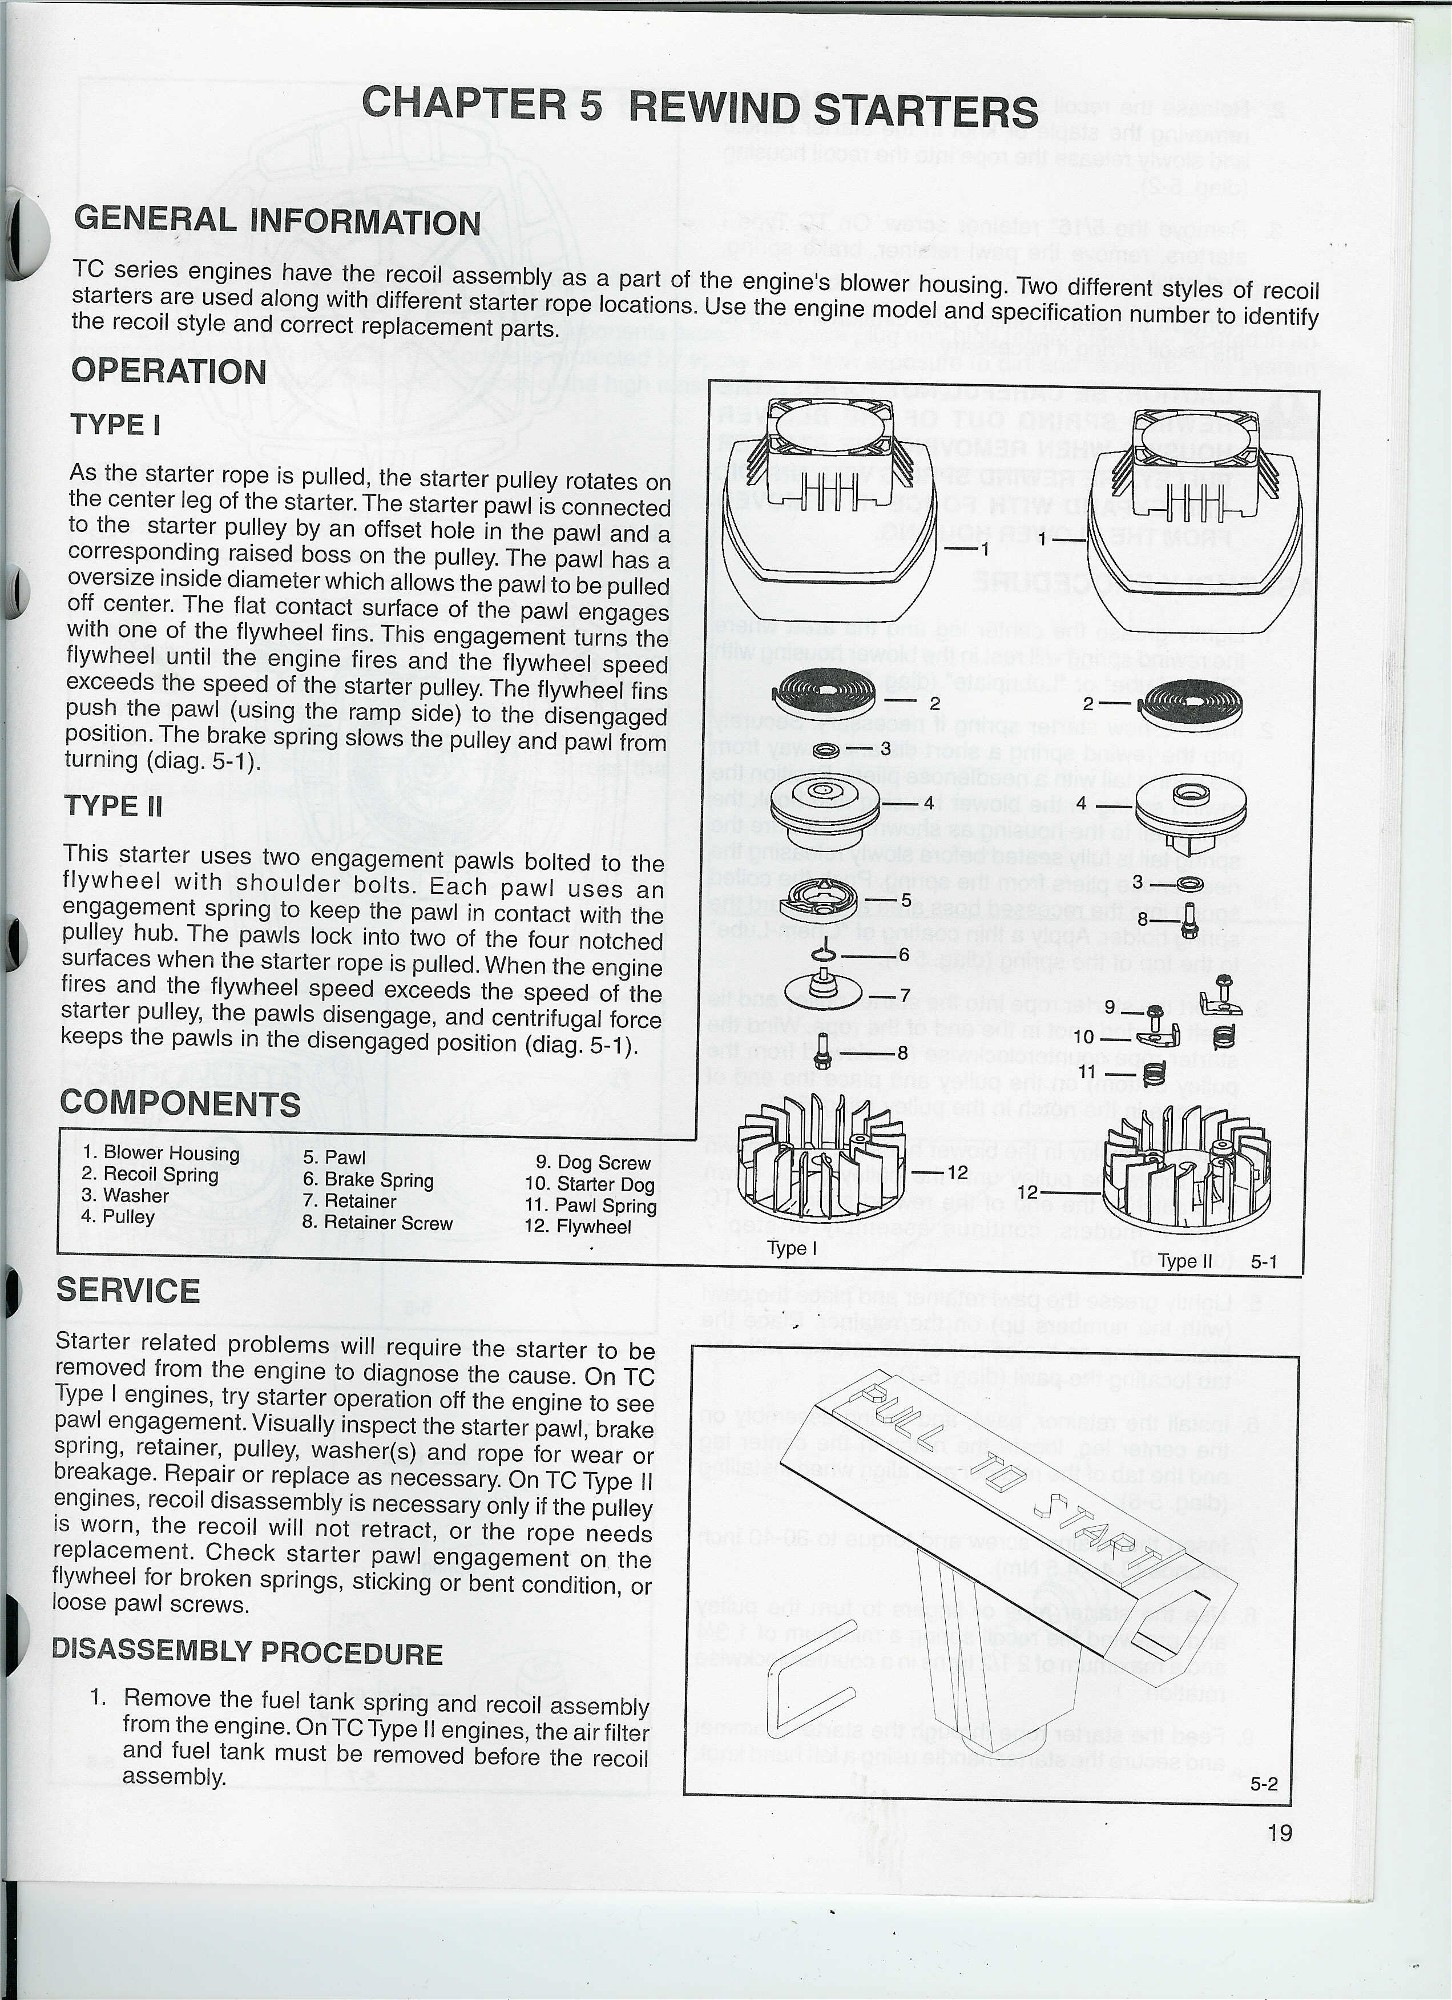 Strikemaster mag 2000 Manual